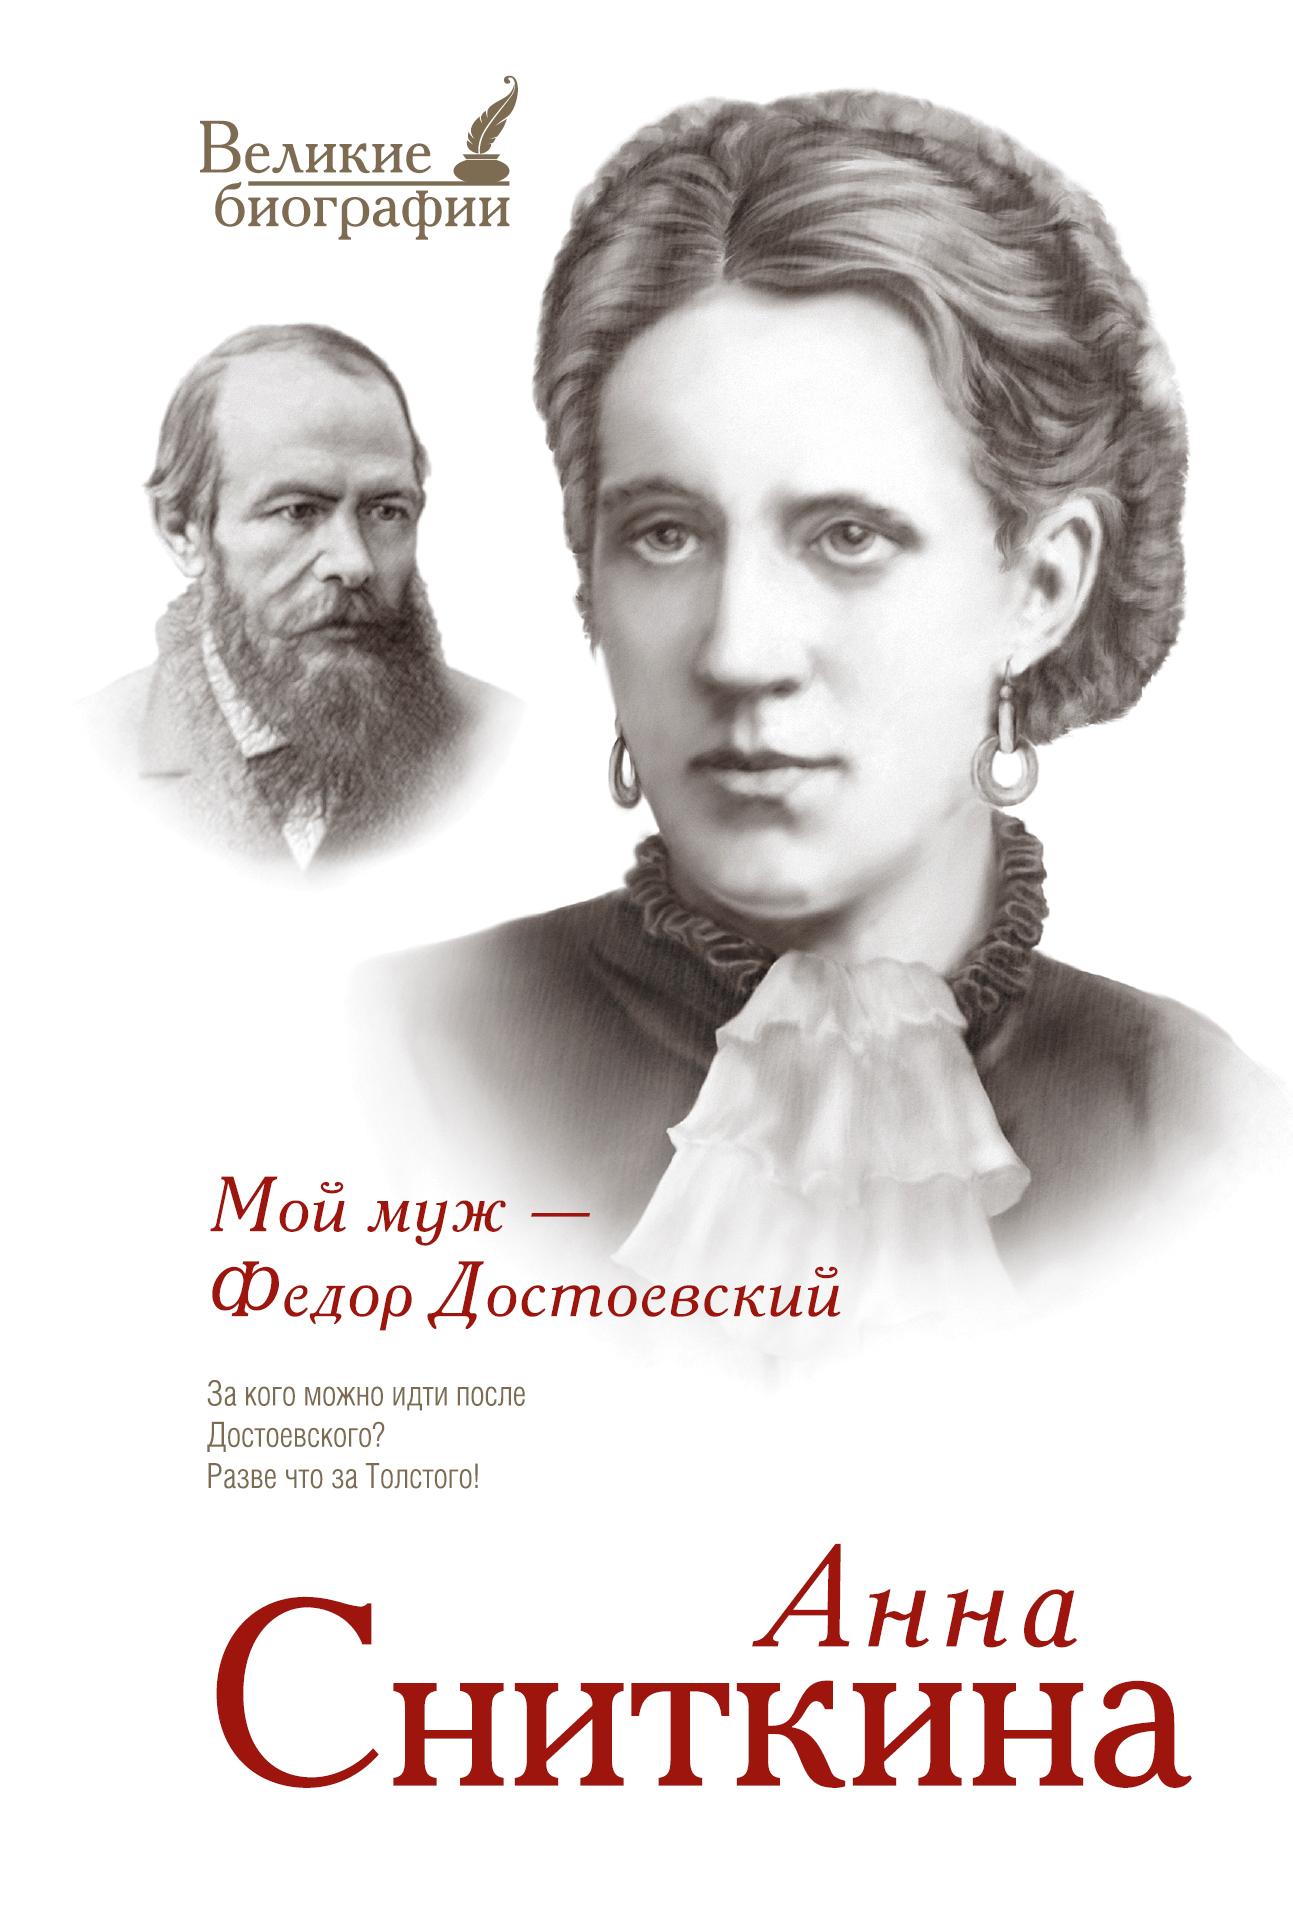 Сниткина Анна Мой муж - Федор Достоевский